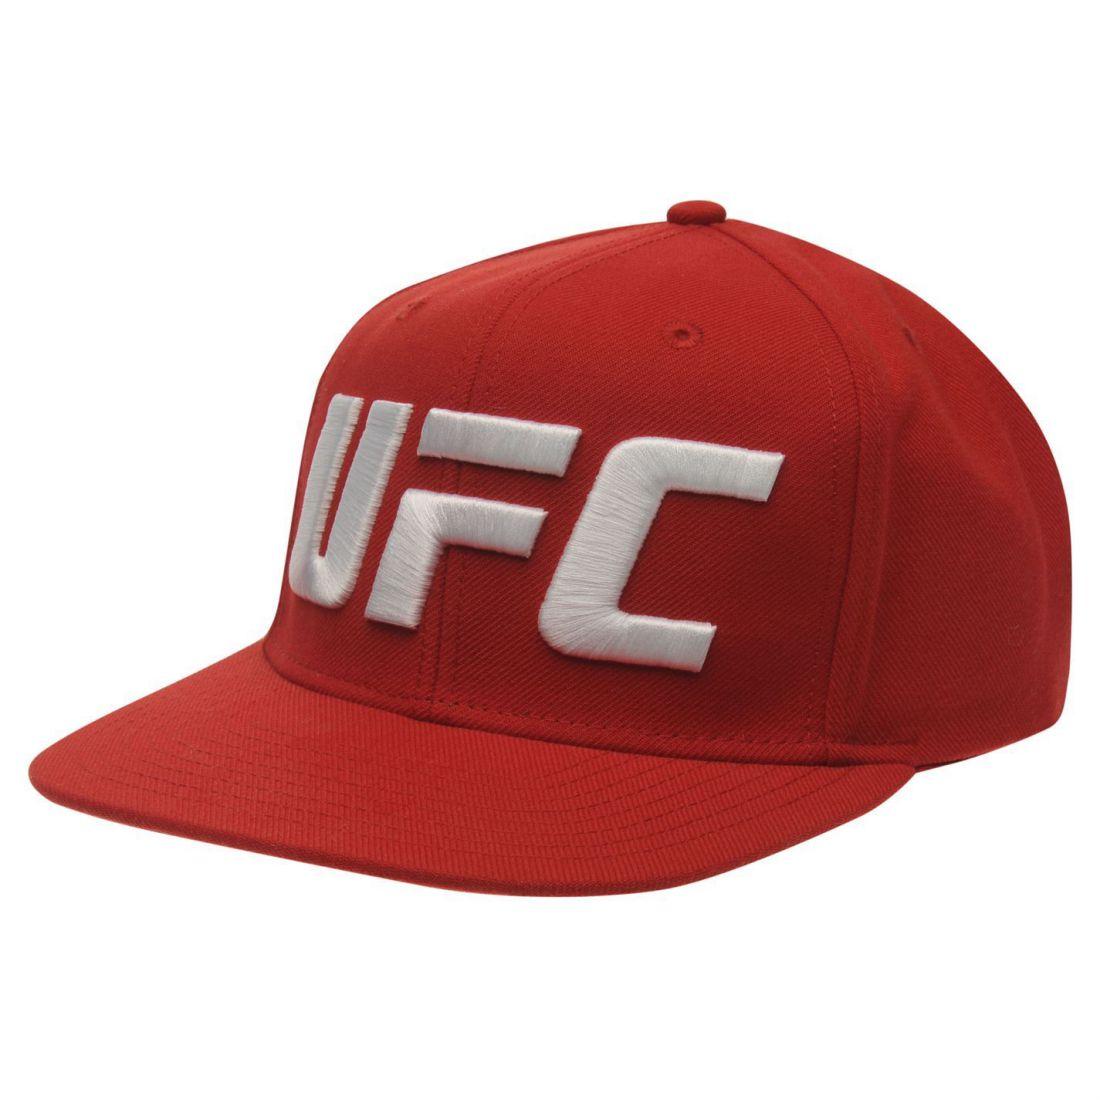 0f8051481 Reebok Mens UFC Design Baseball Cap Snapback Hat Flat Peak